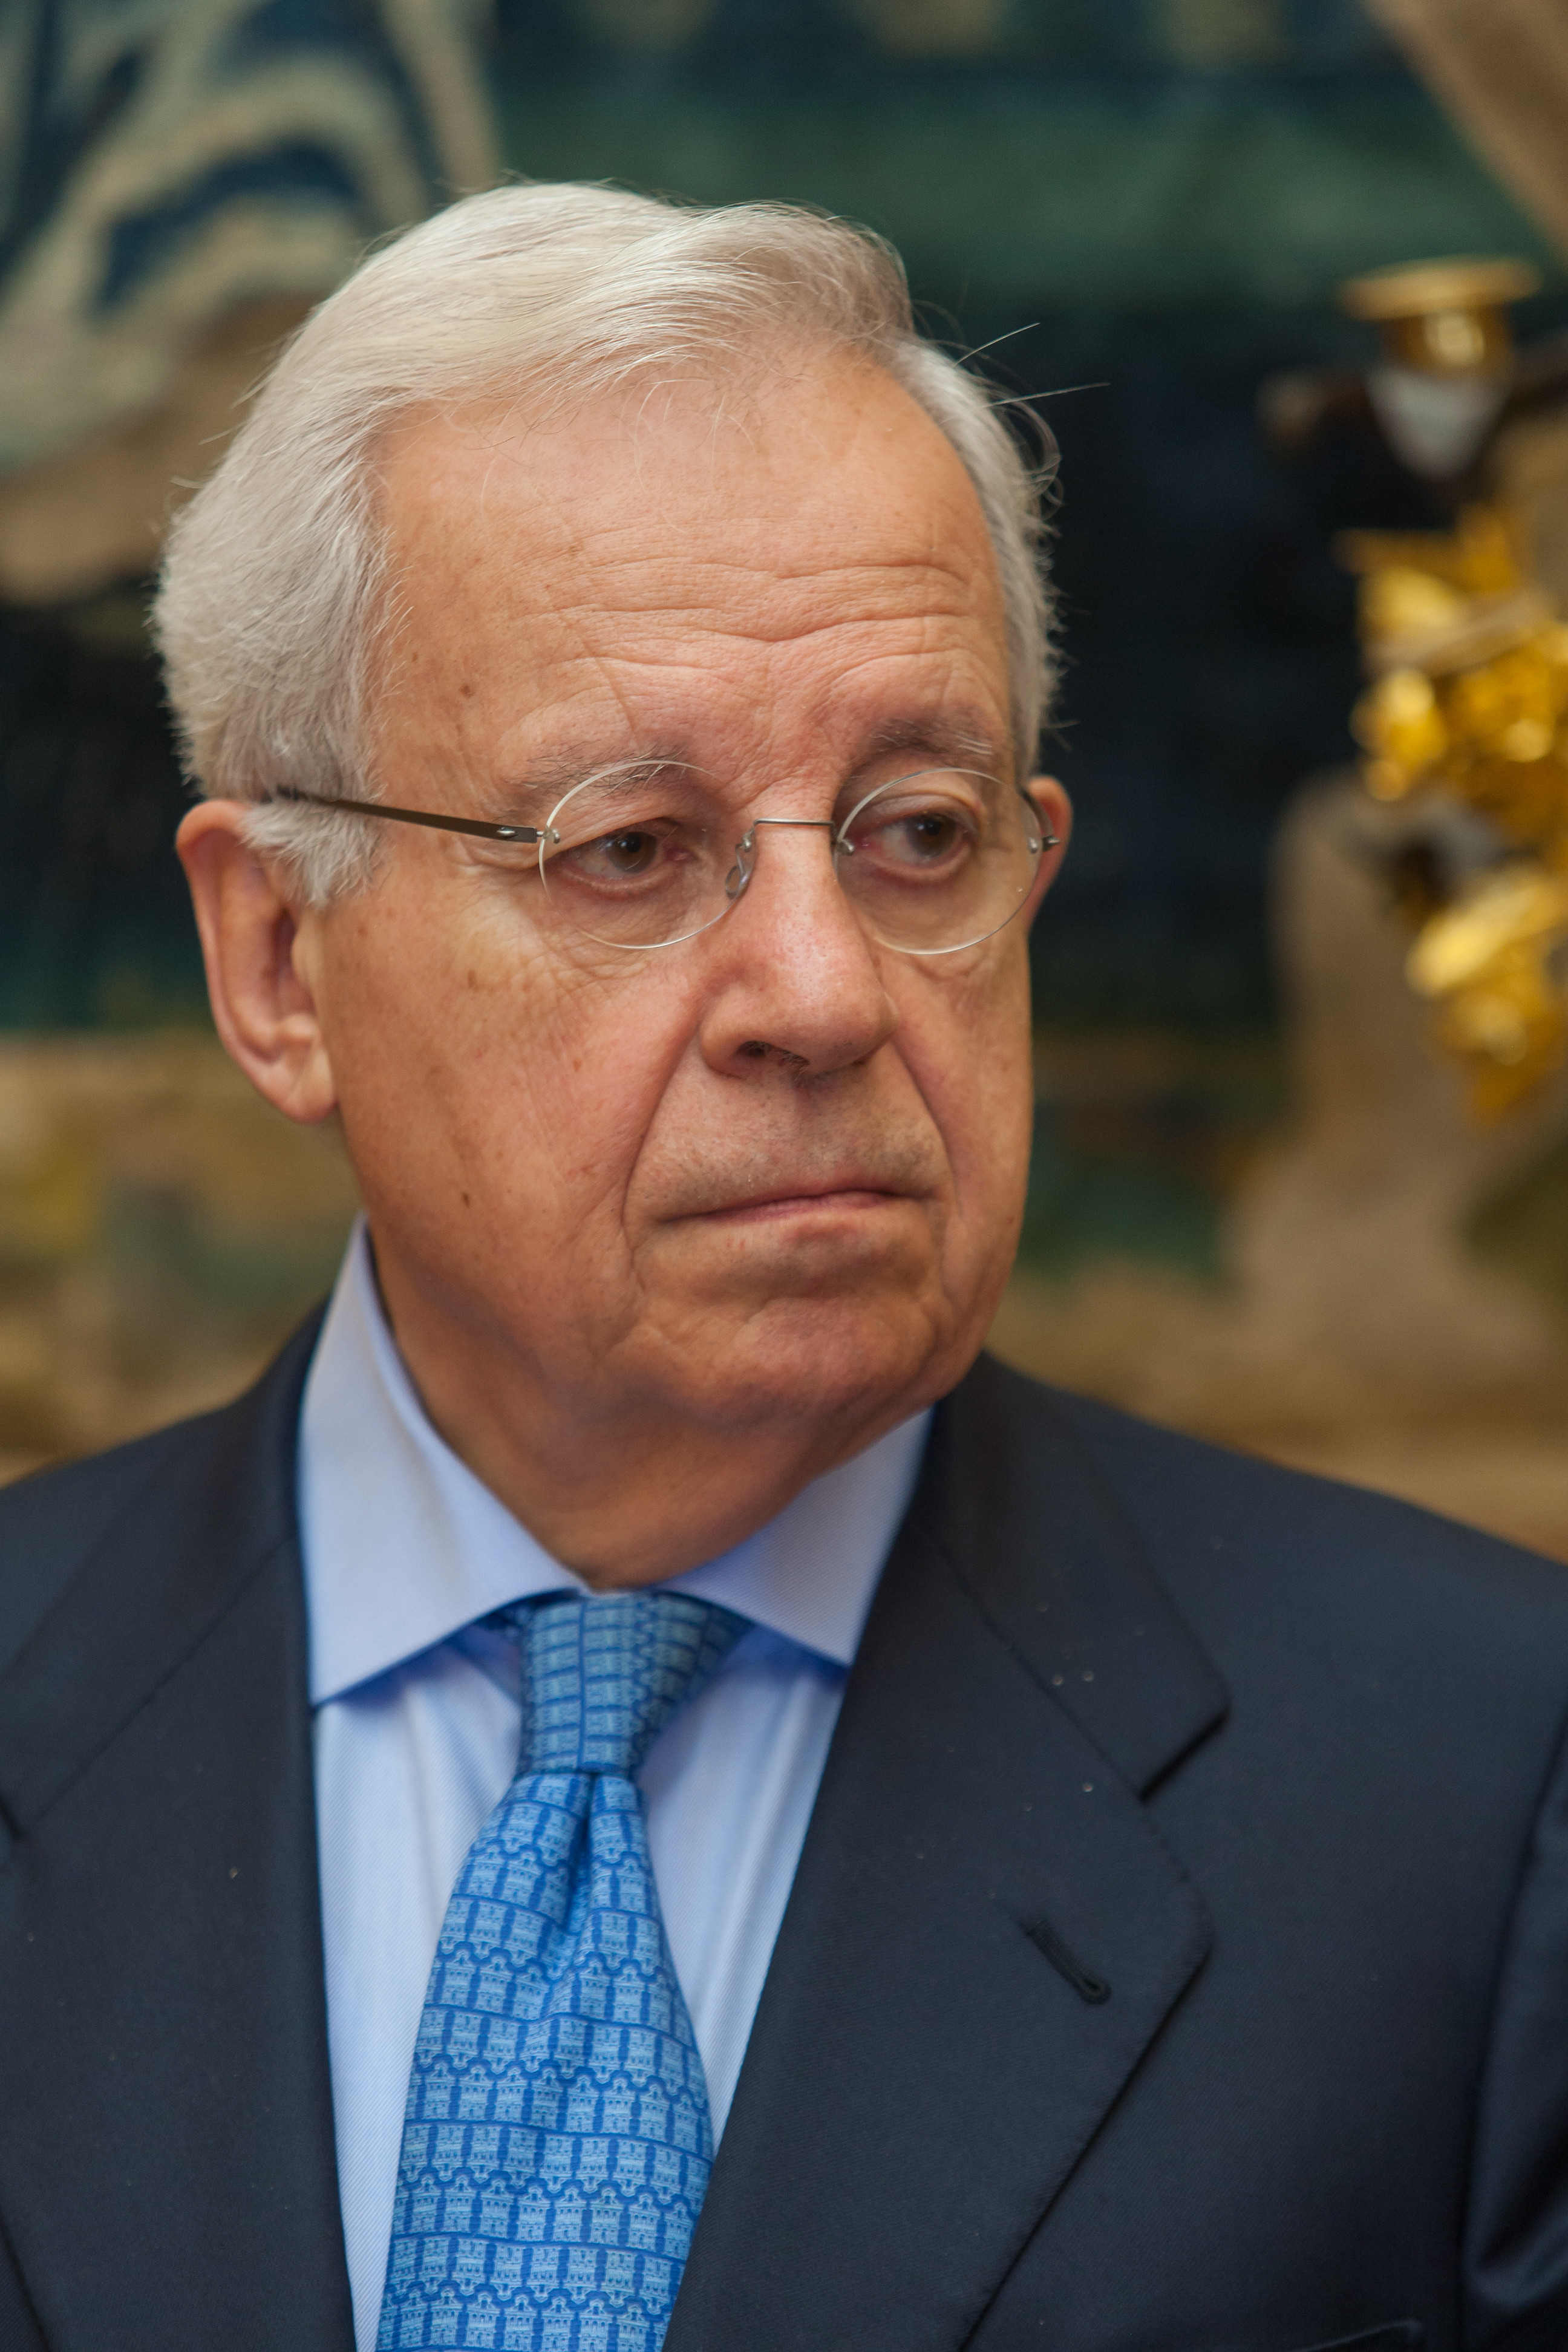 Jaime Ignacio del Burgo Tajadura